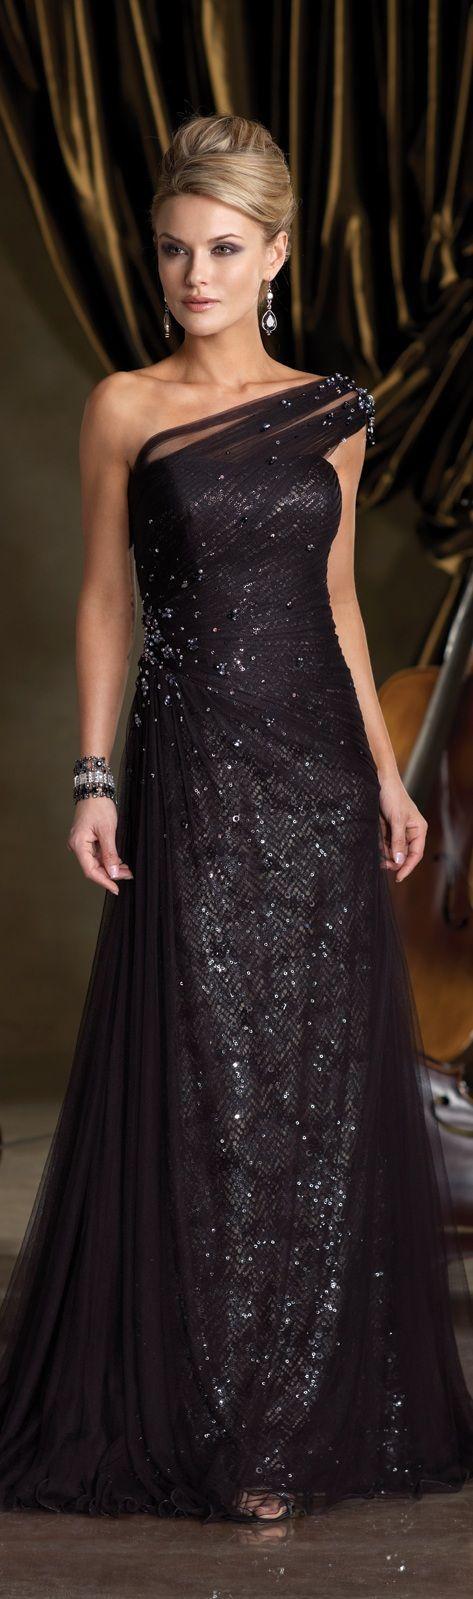 Patrones y Costura: WONDERFUL LONG DRESS